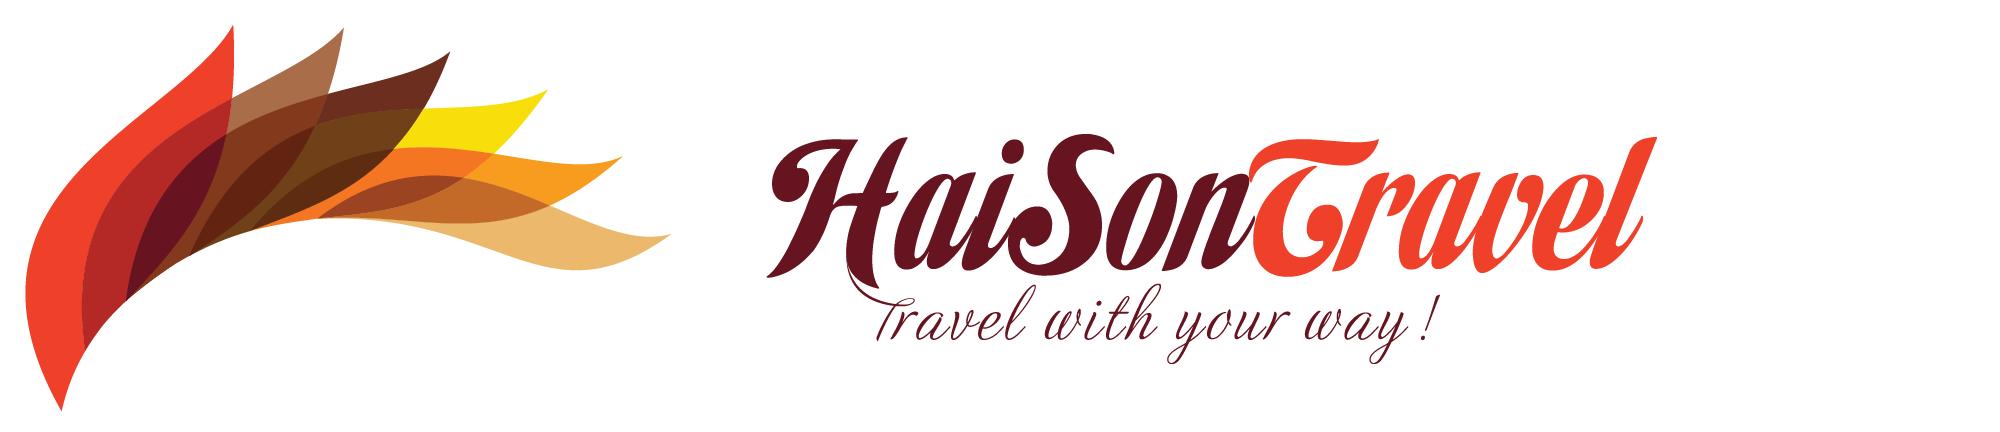 Haison Travel